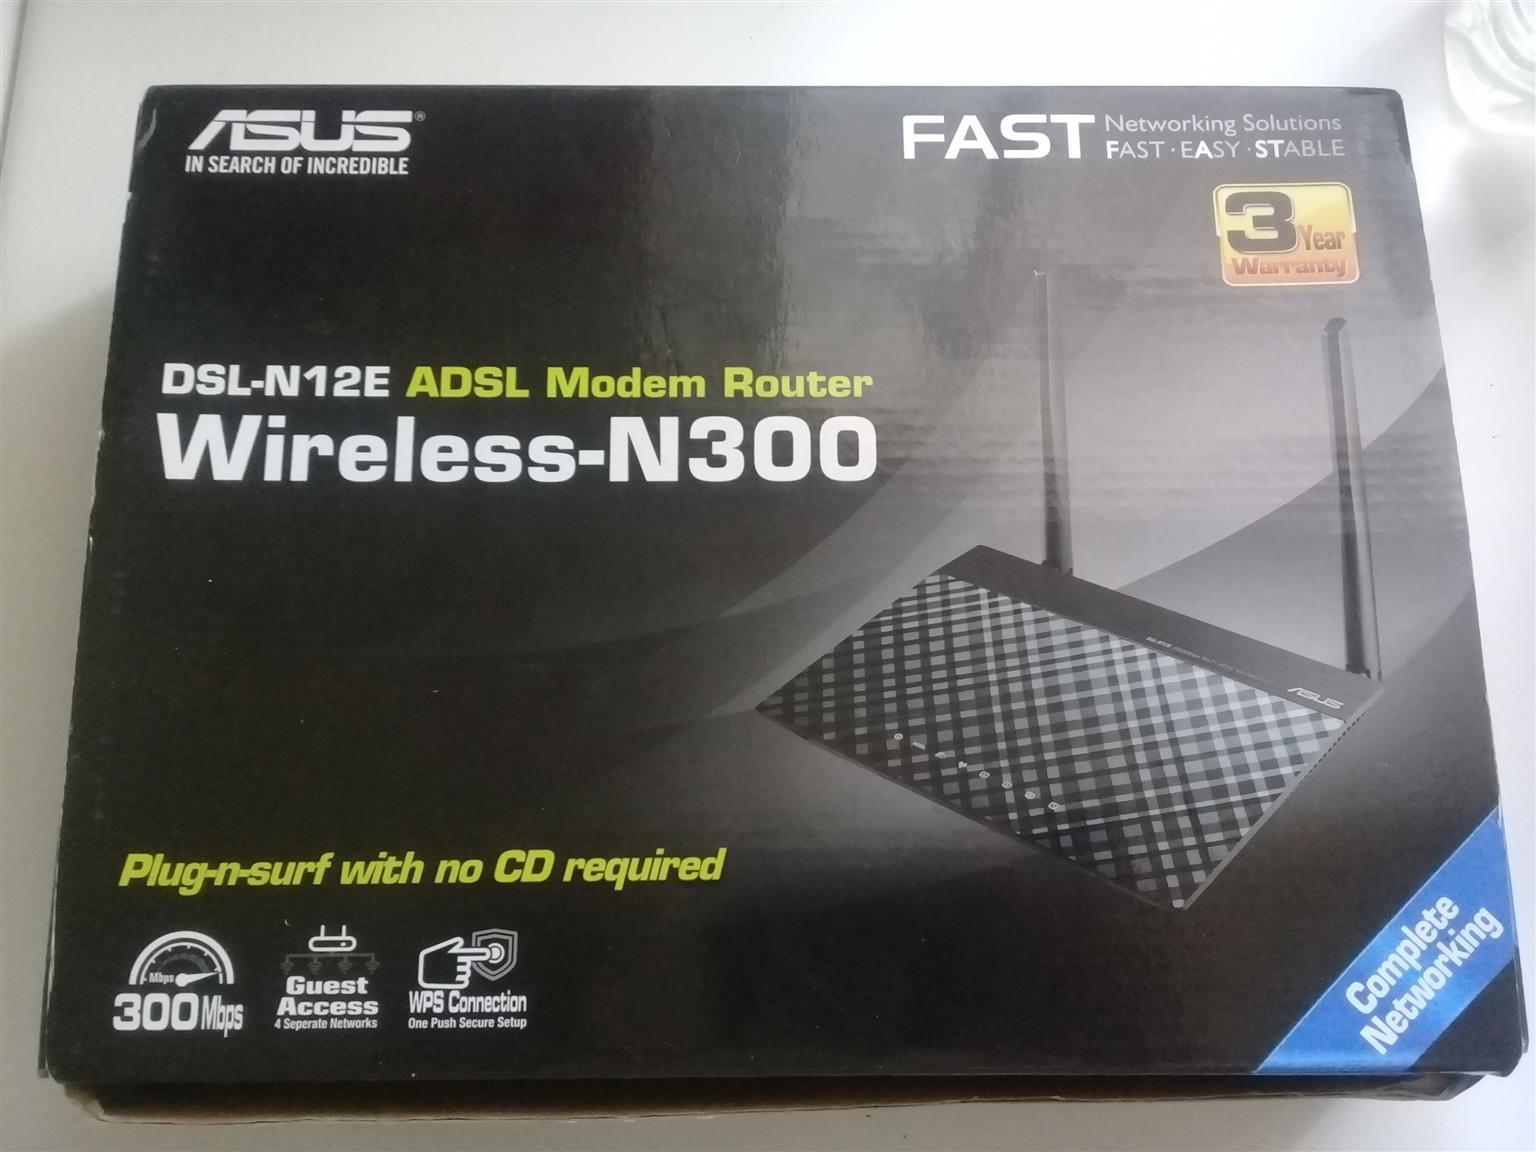 Asus Wireless-N300 modem